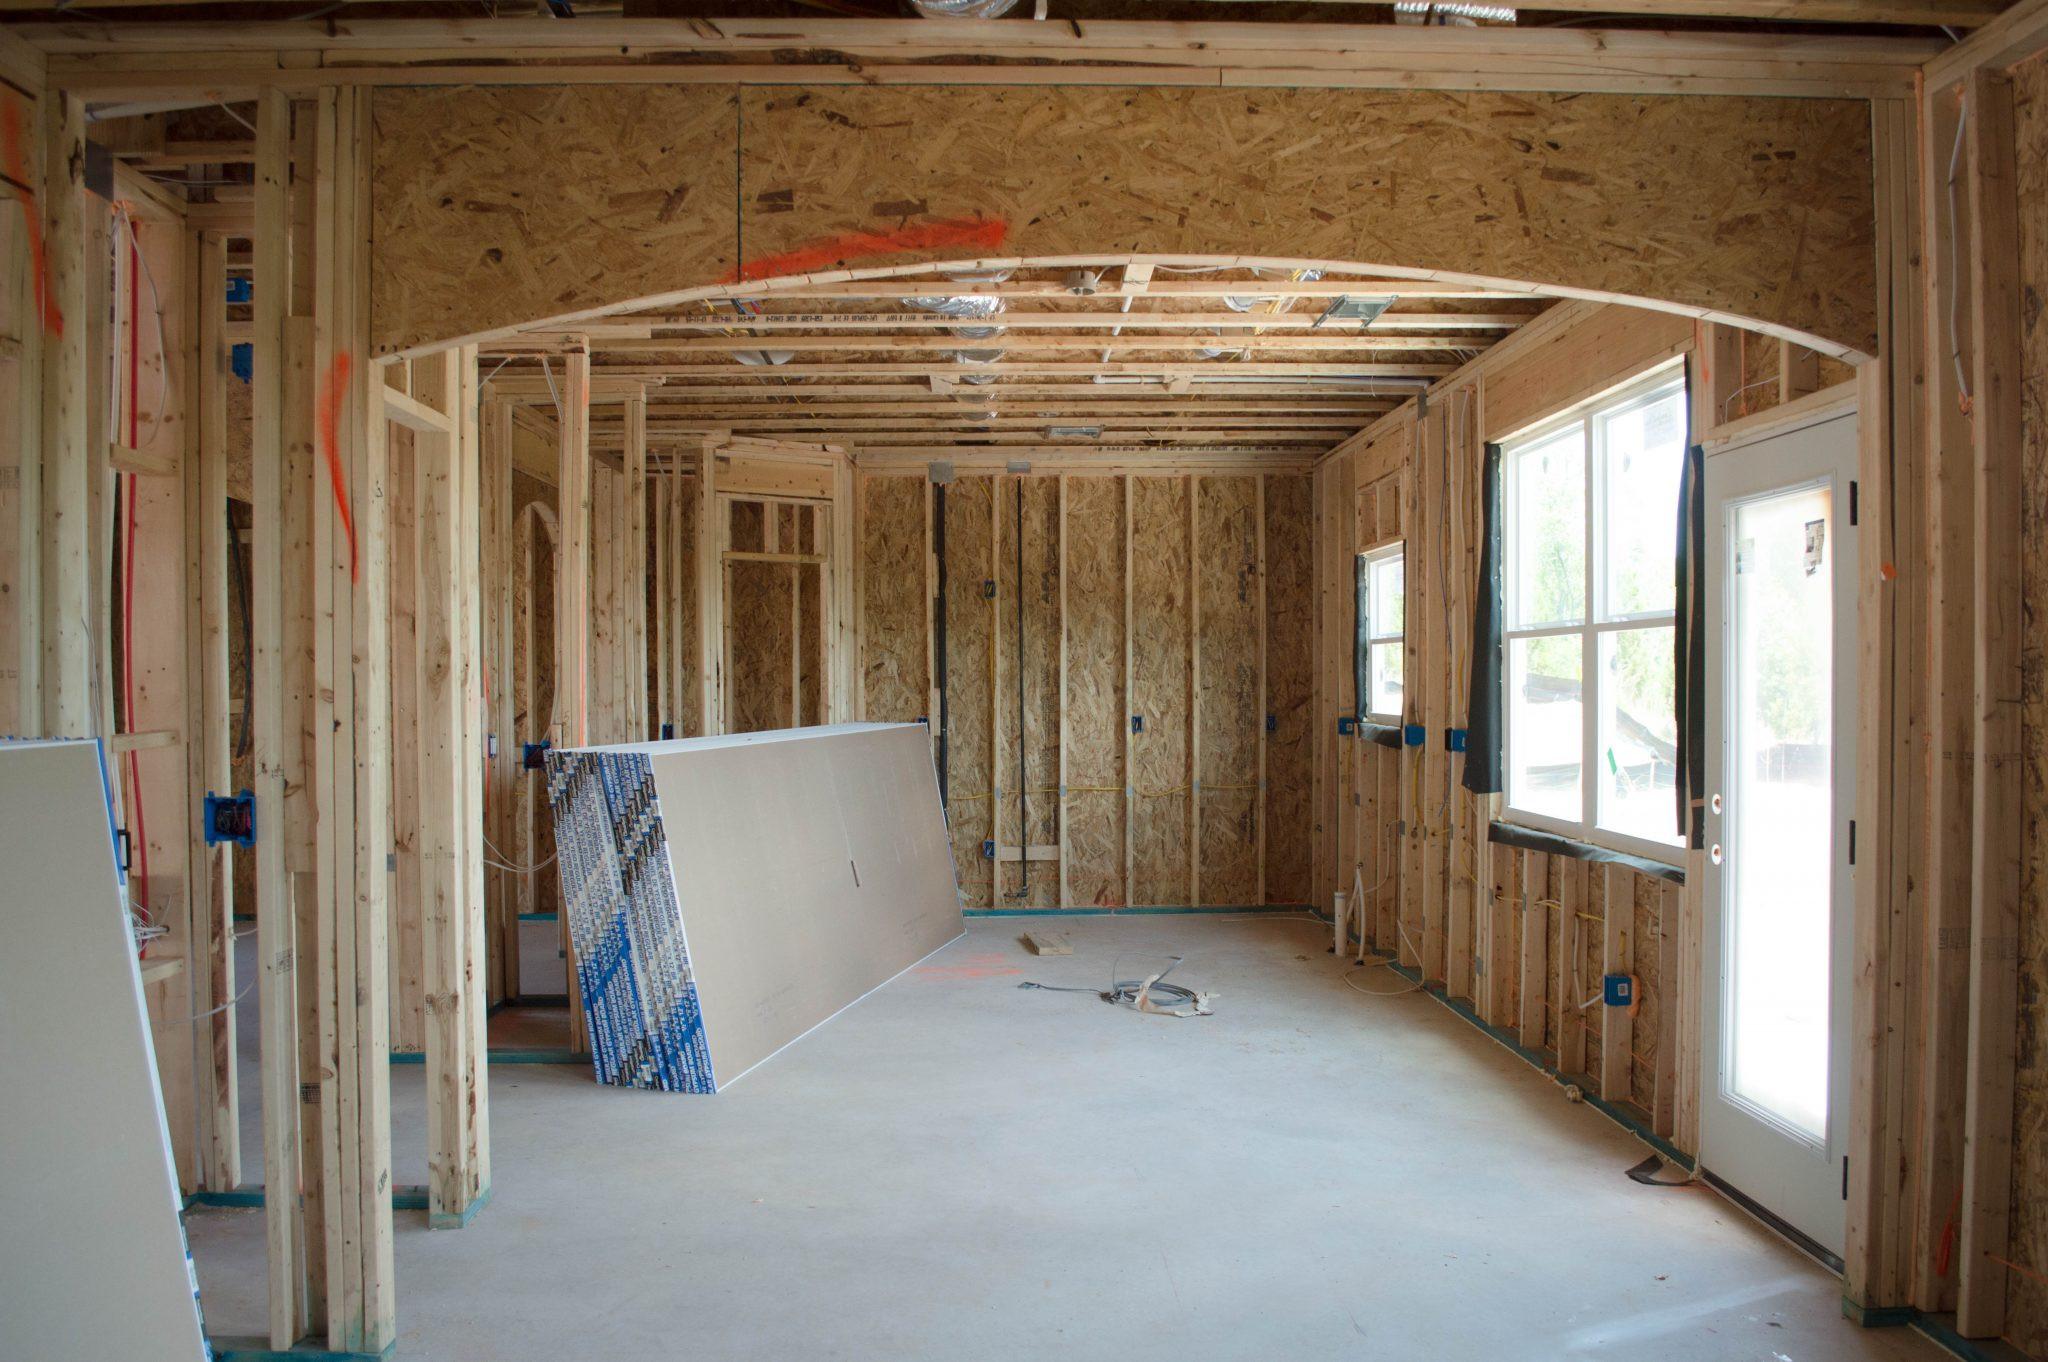 aaa hardwood floors phoenix az of manchester meadows in villa rica ga new homes floor plans by with brookside